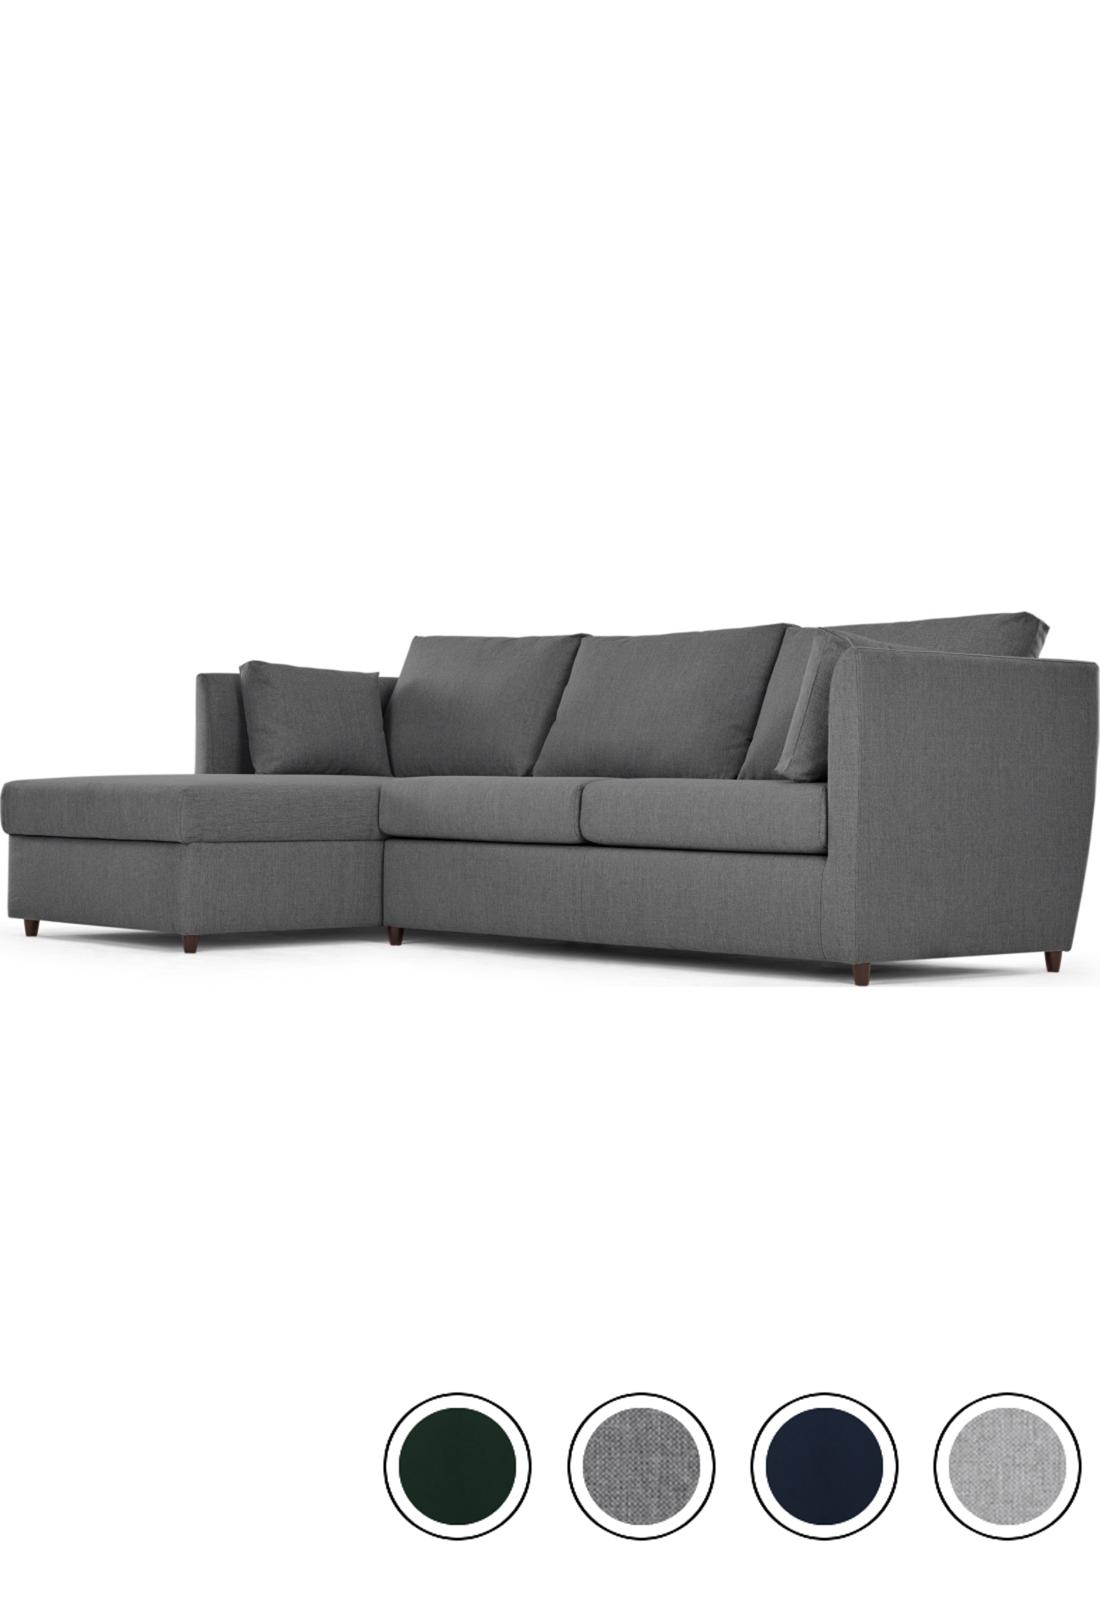 Made Night Grey Corner Sofa Bed Corner Sofa Bed With Storage Sofa Bed Sofa Bed With Chaise